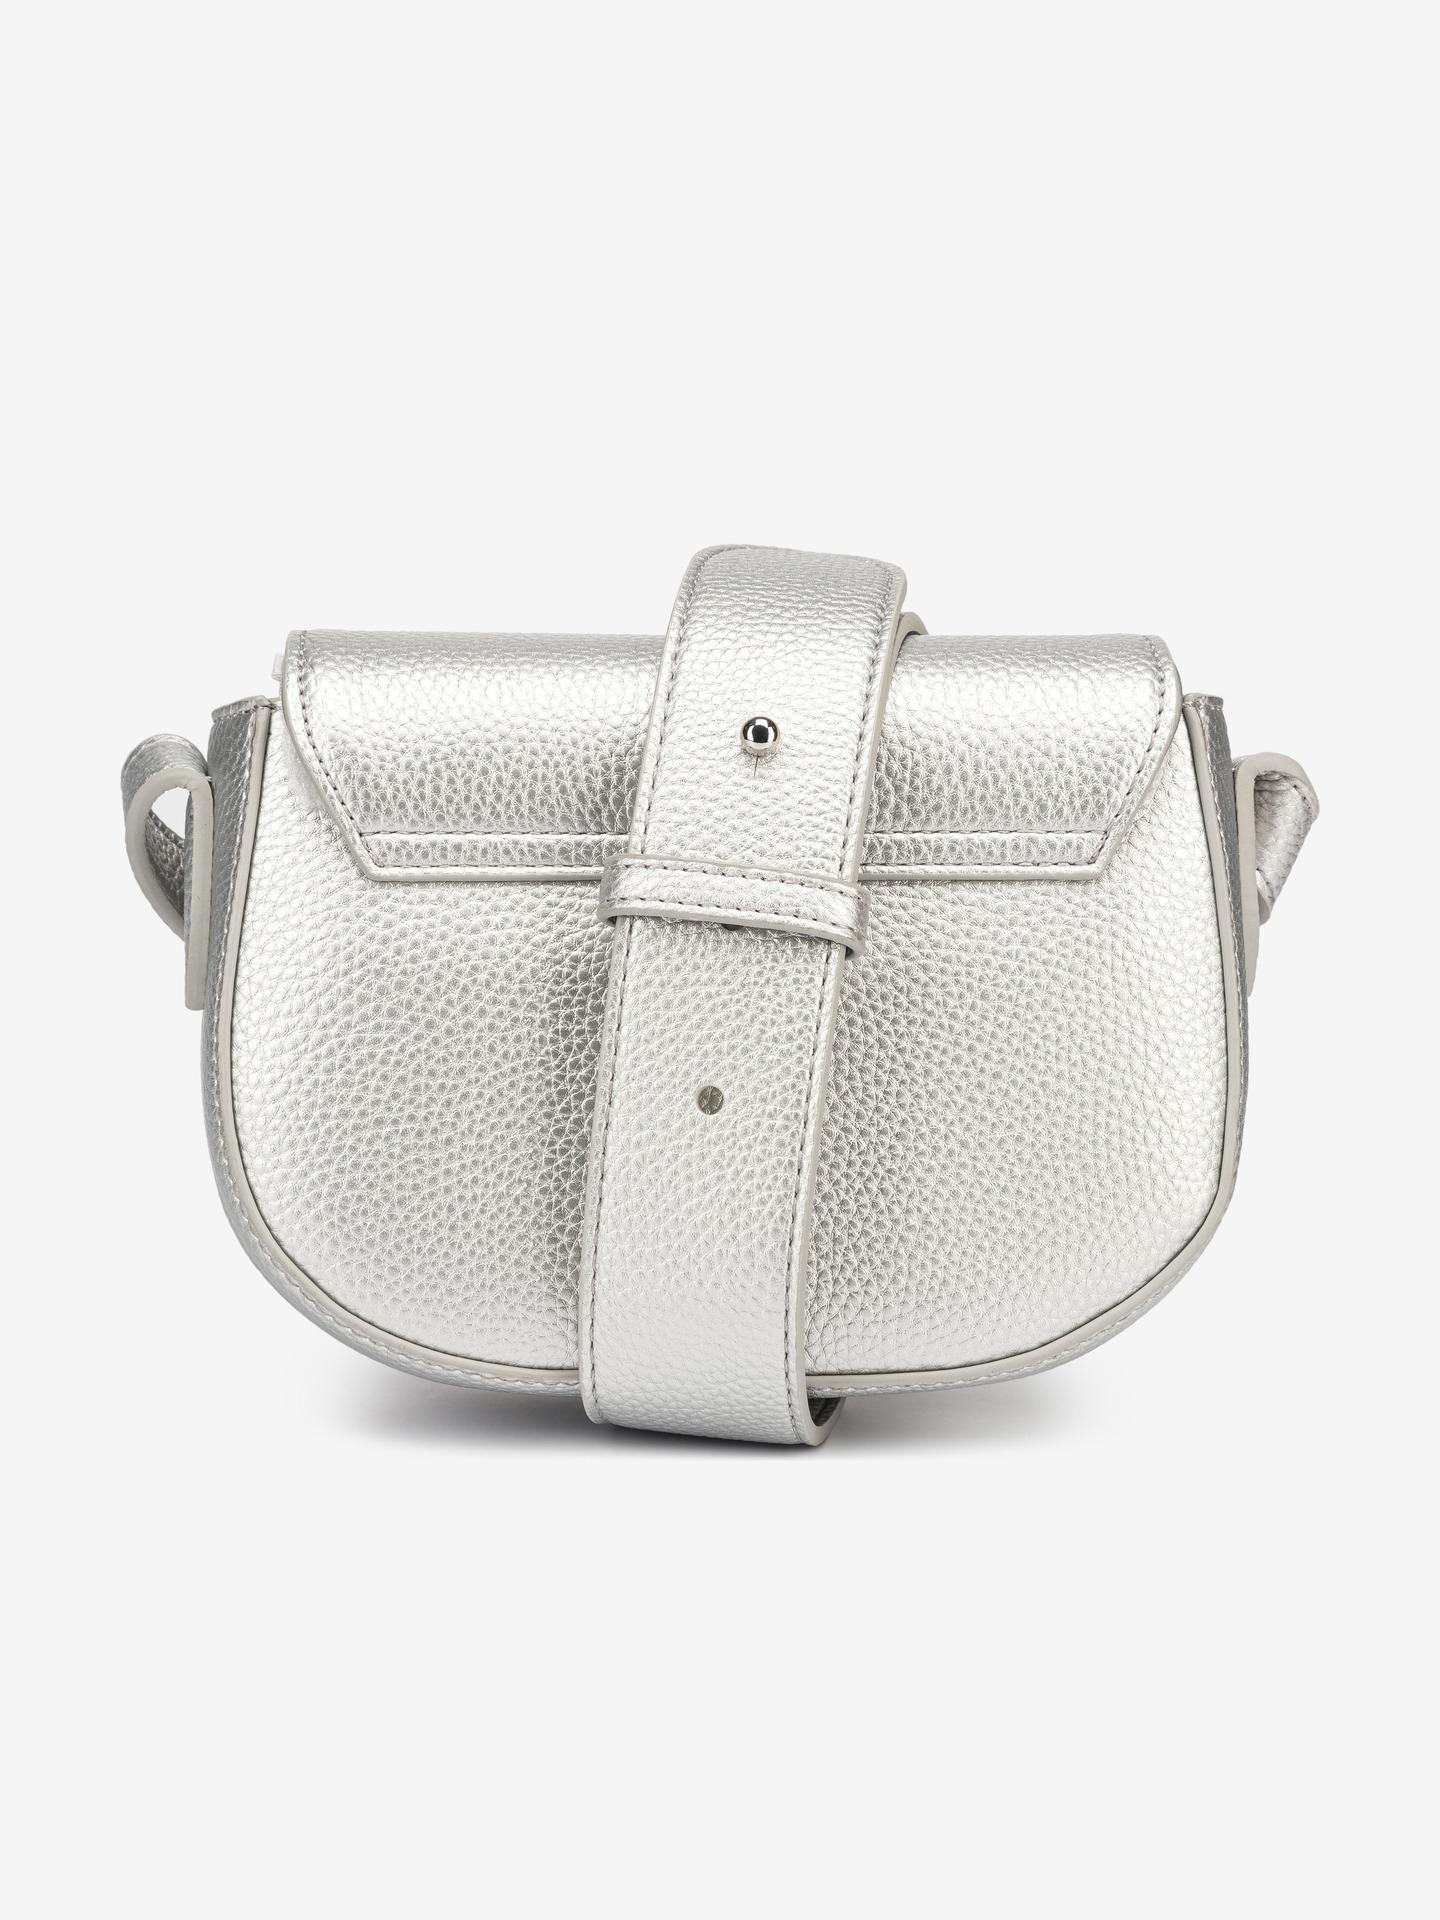 Armani Exchange stříbrné kabelka